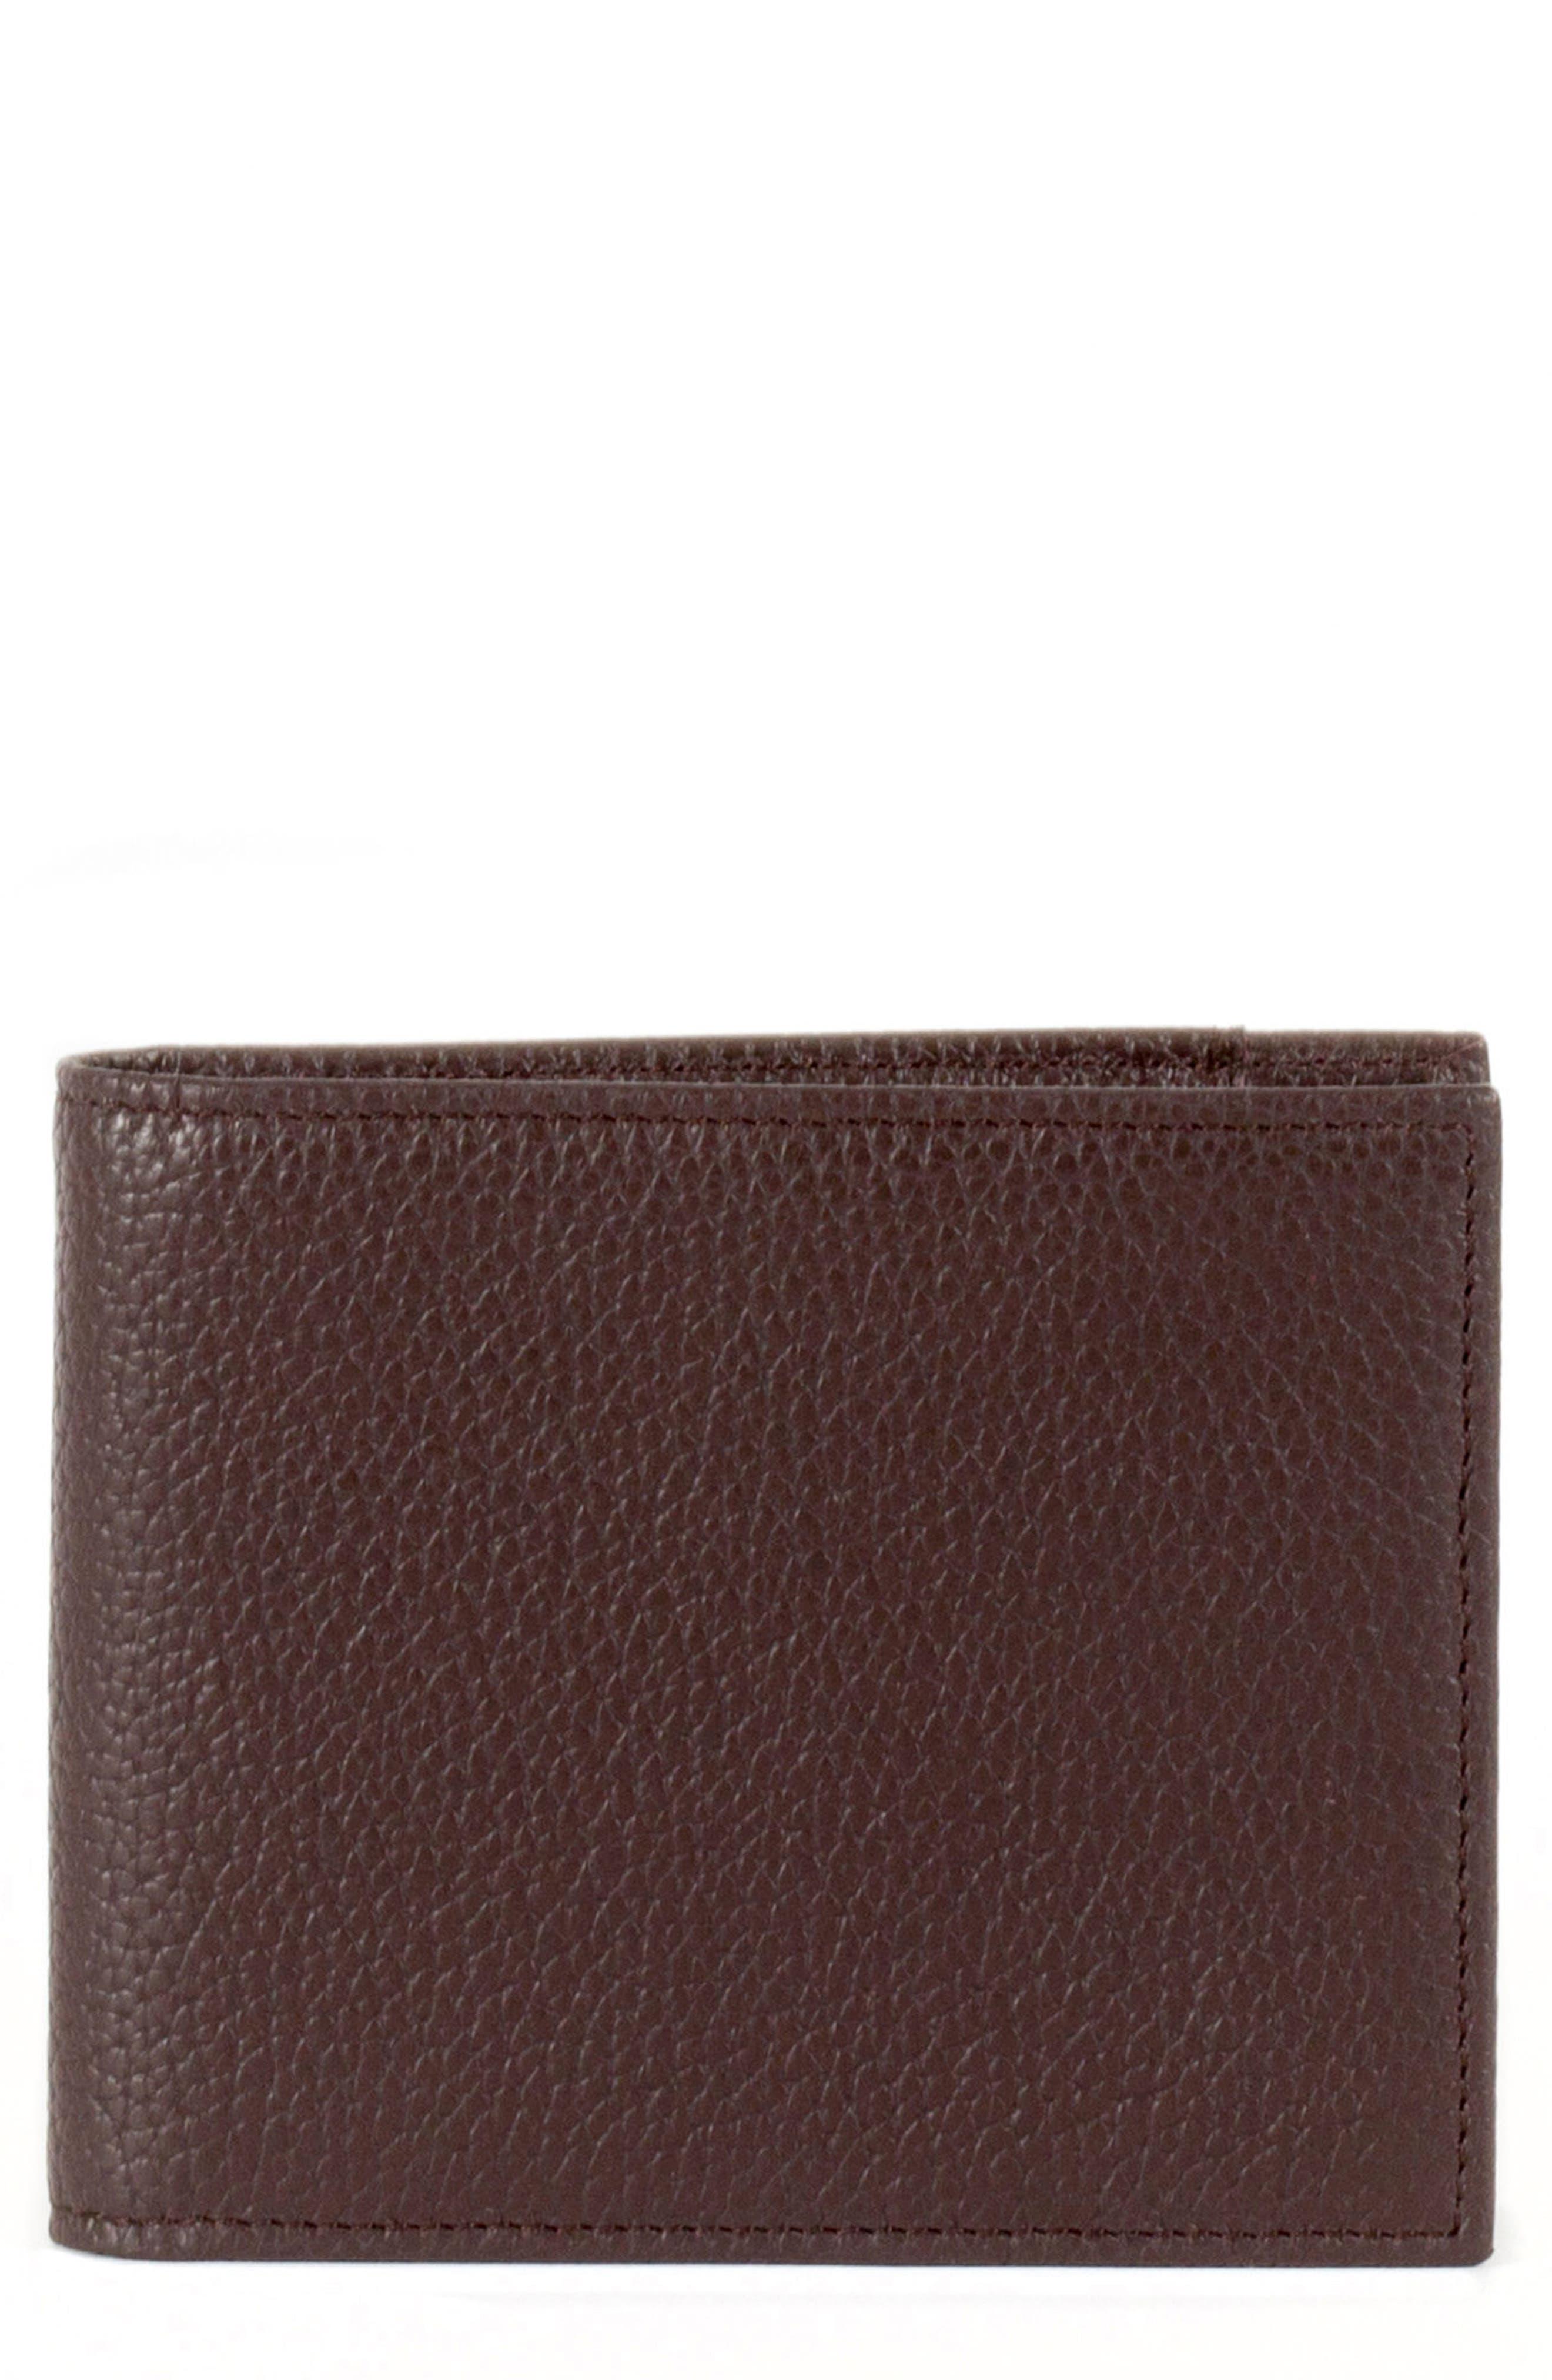 Garth Leather Bifold Wallet,                             Main thumbnail 1, color,                             Brown/ Tan/ Purple